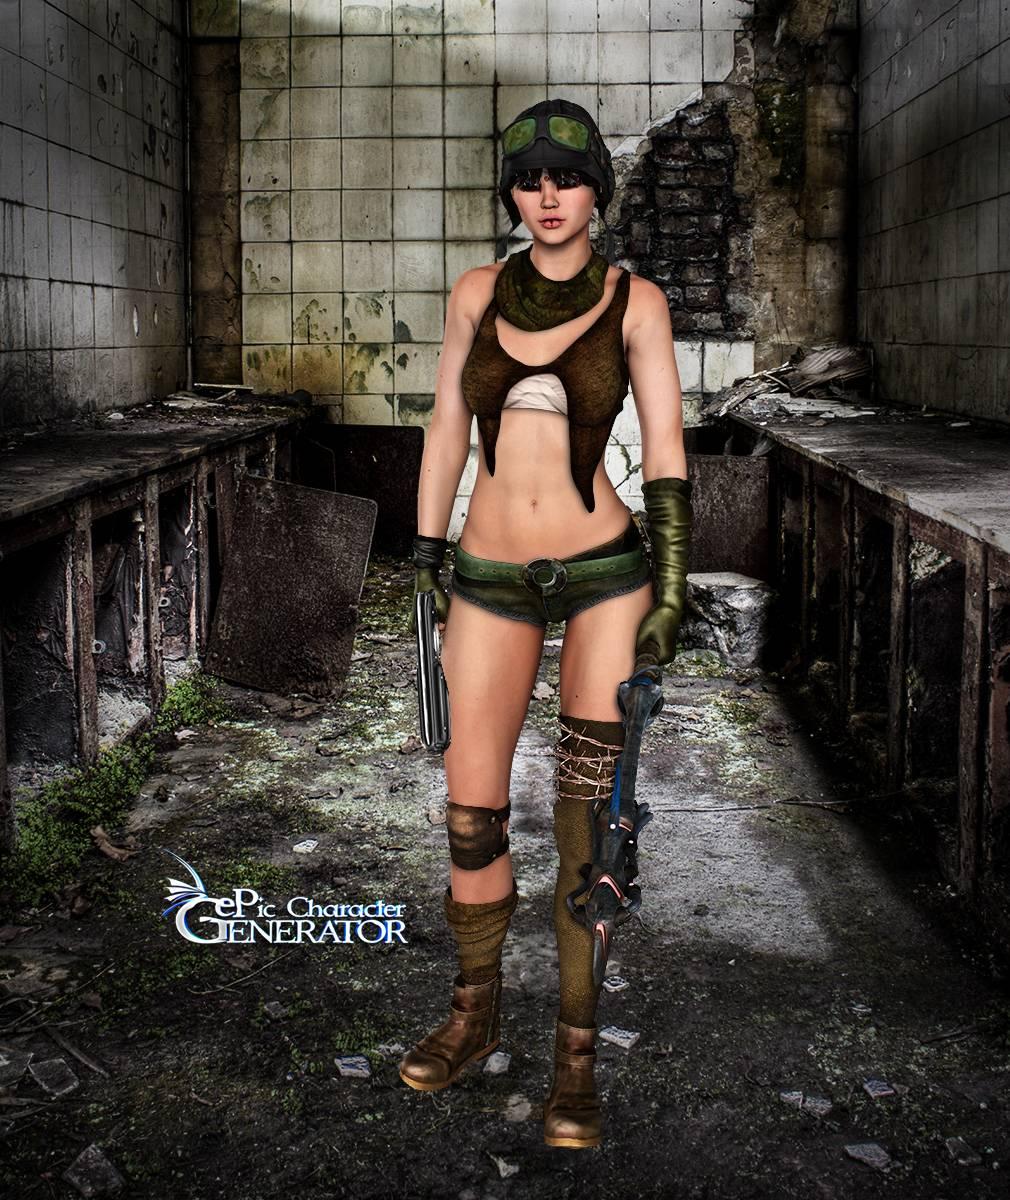 ePic Character Generator Season 2 Female Post Apocalyptic Screenshot 12